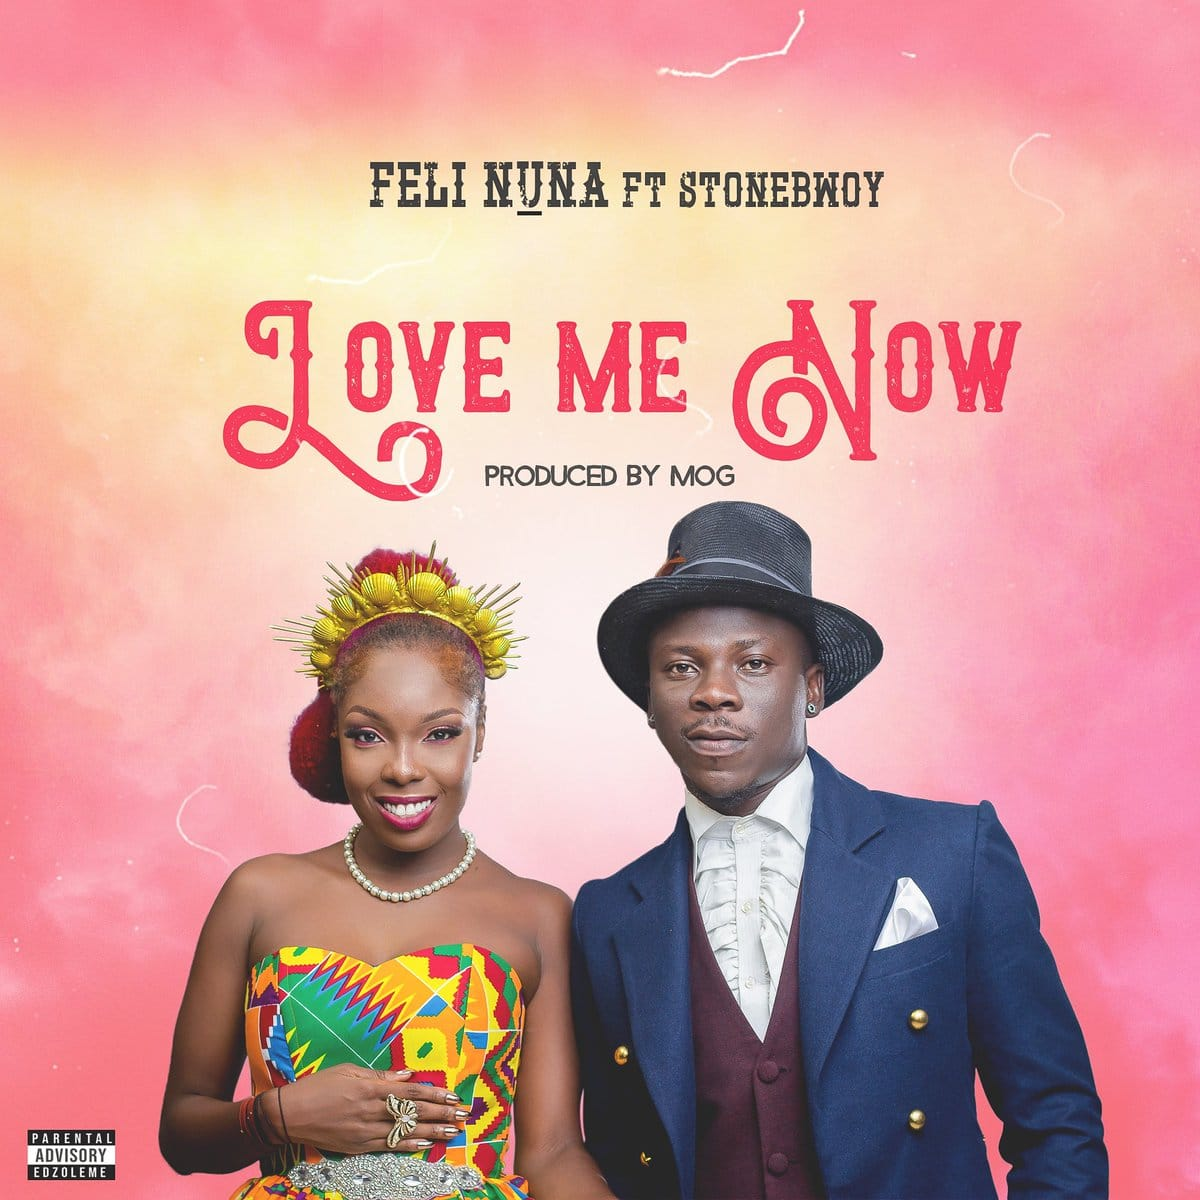 feli Nuna love me now Ghana music feli nuna songs feli nuna latest feli nuna news